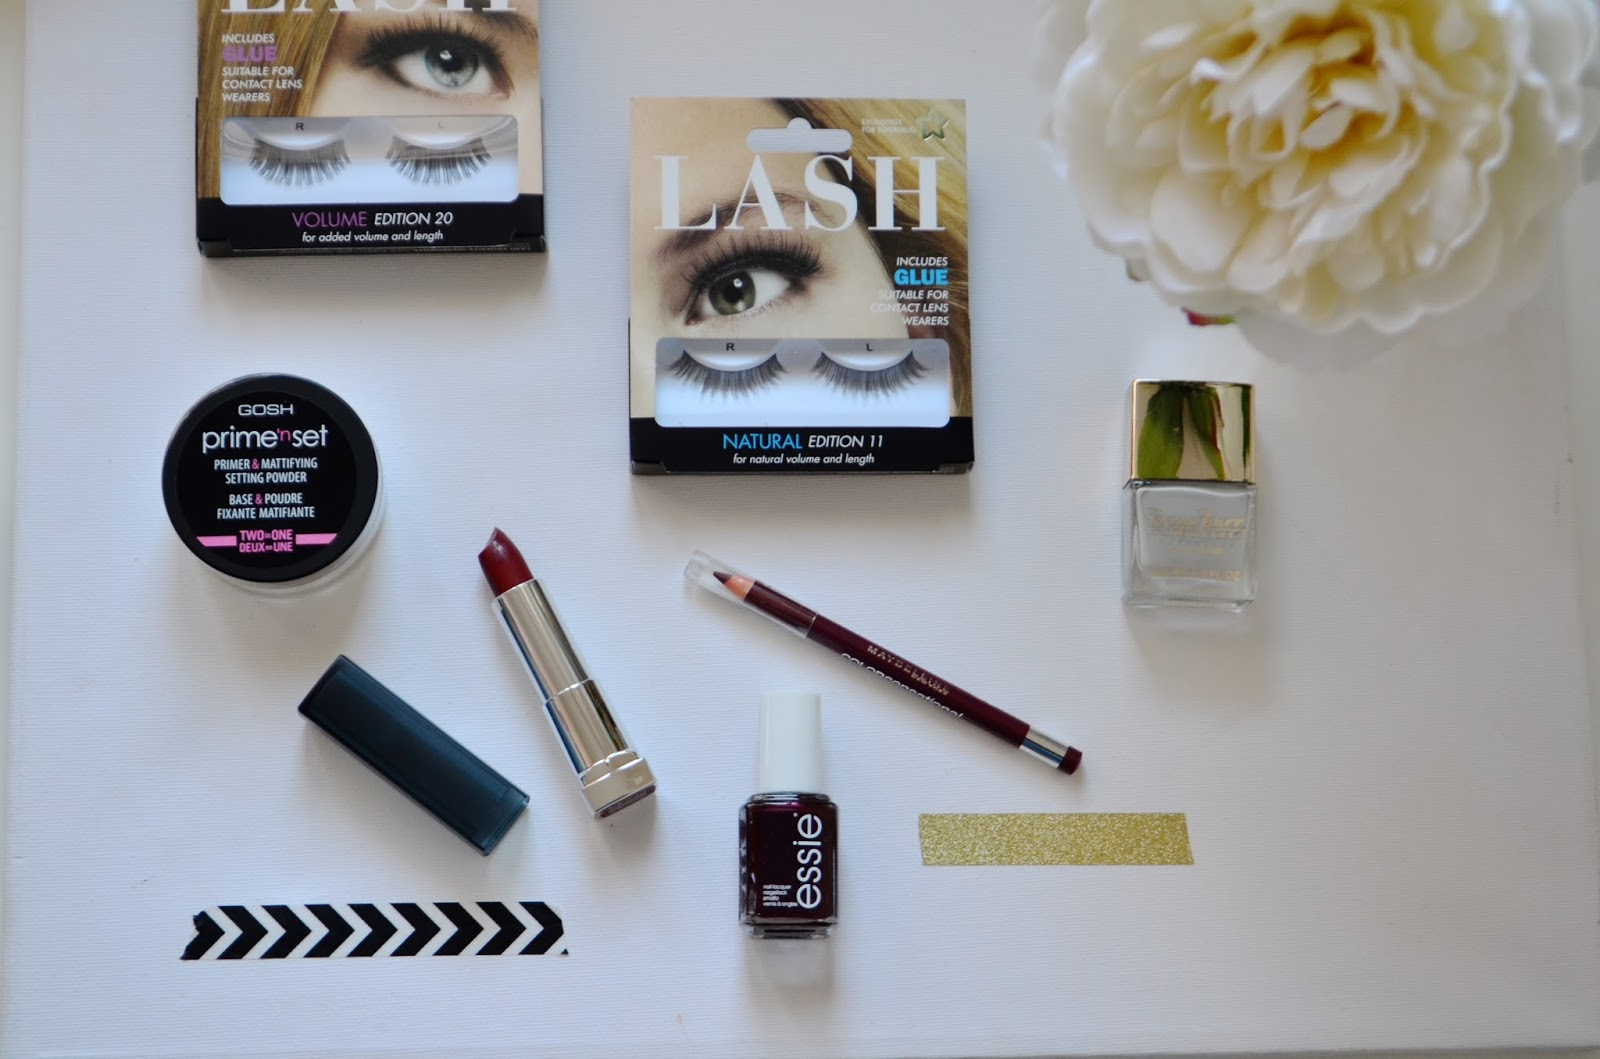 Beauty, Make up, Drugstore, Superdrug, super drug haul, Drugstore Haul, false lashes, a/w make up, a/w beauty products, Maybelline, tanya burr, Essie, Gosh,